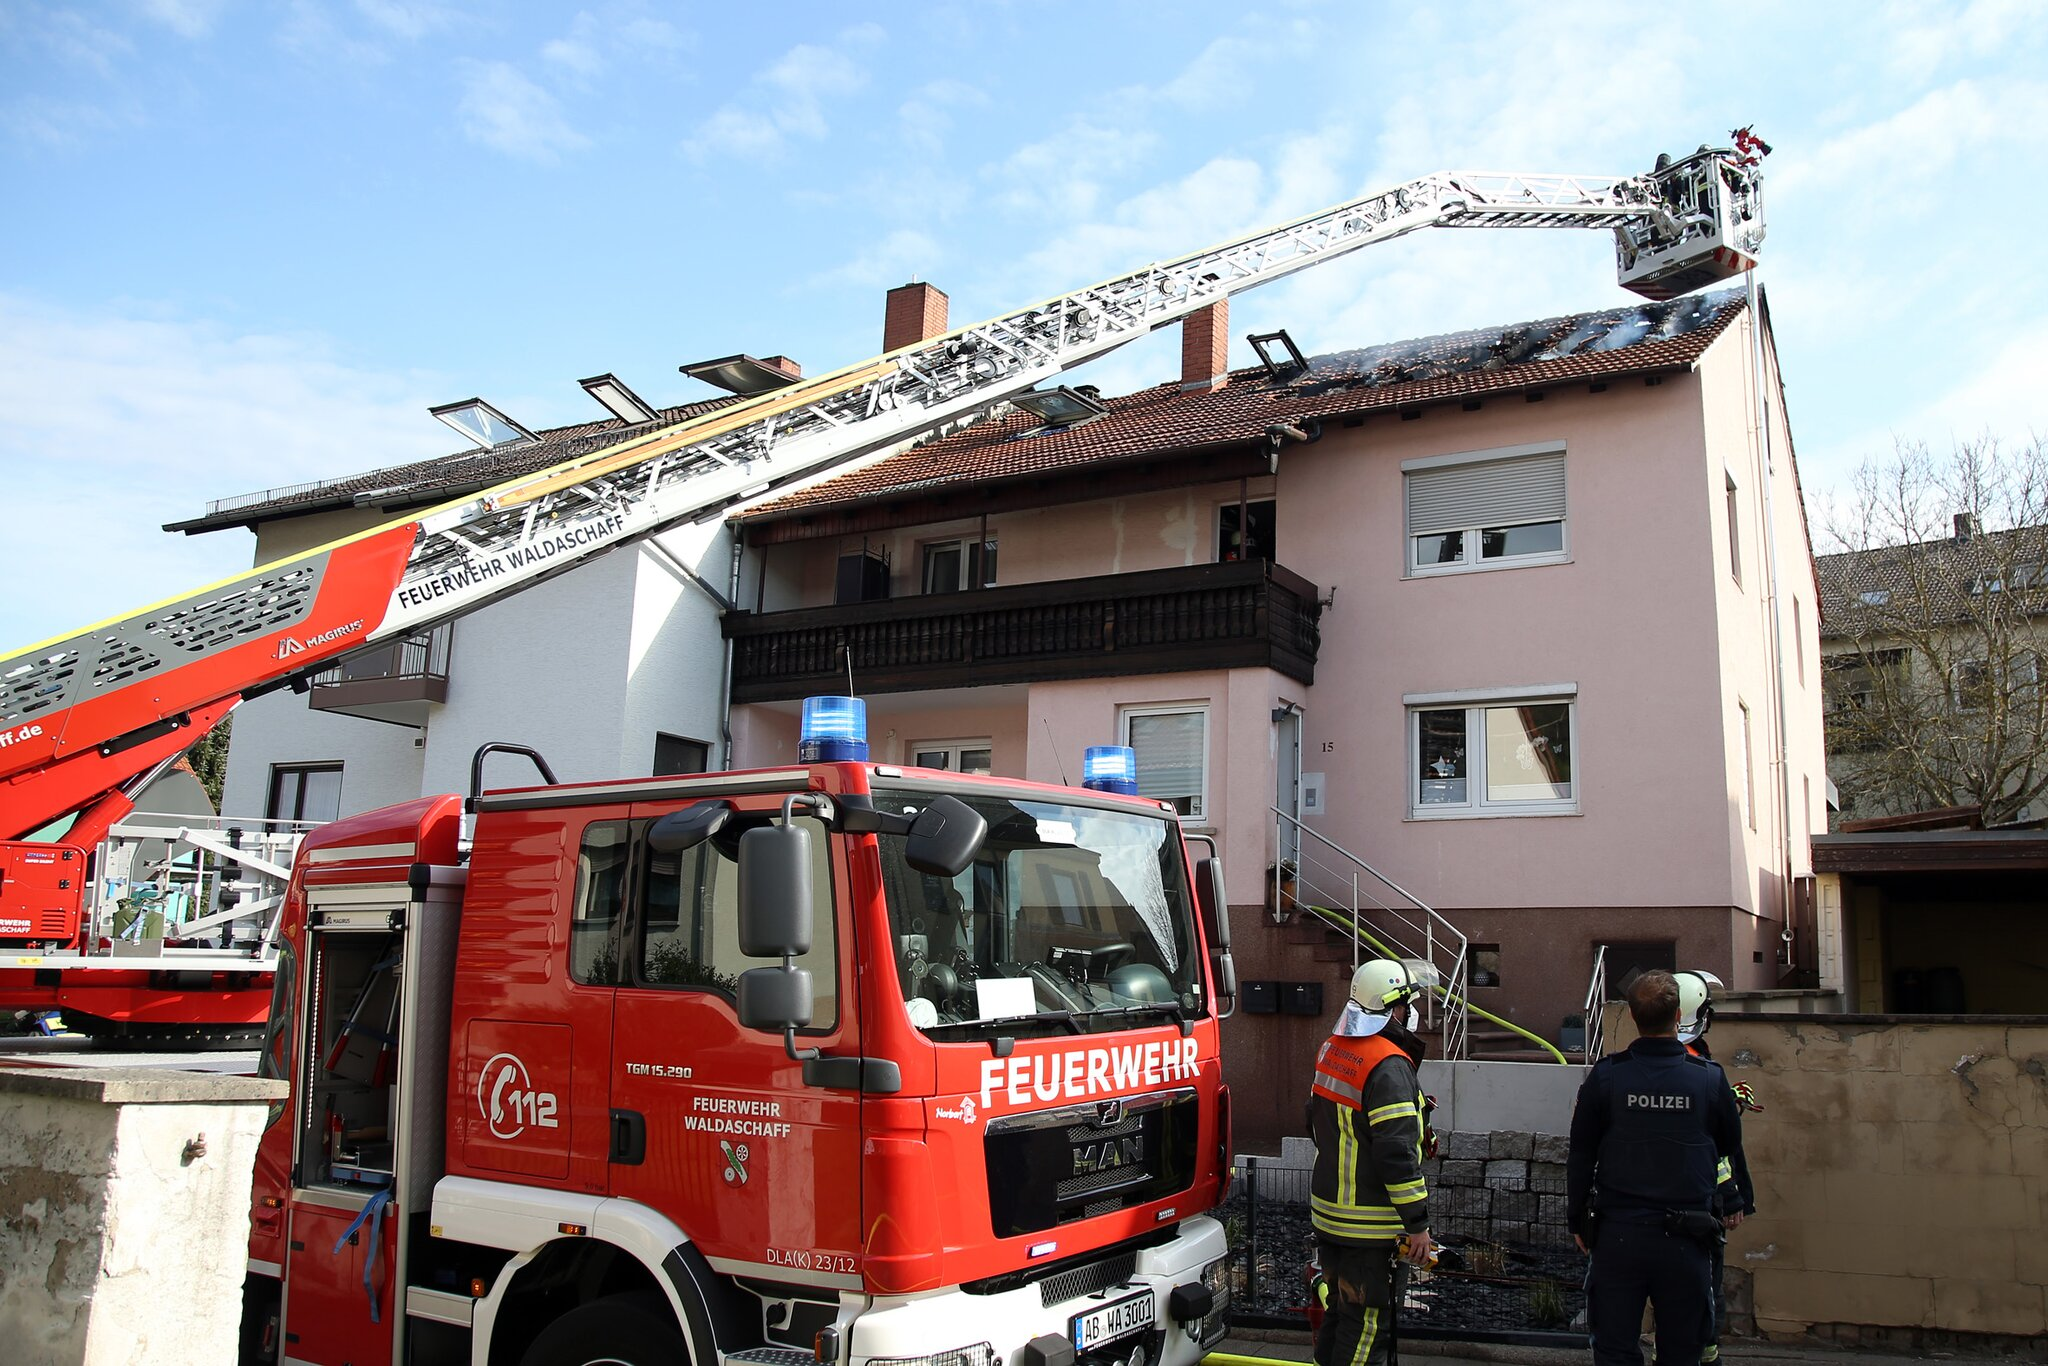 Dachstuhlbrand-in-Waldaschaff-am-17-04-2021